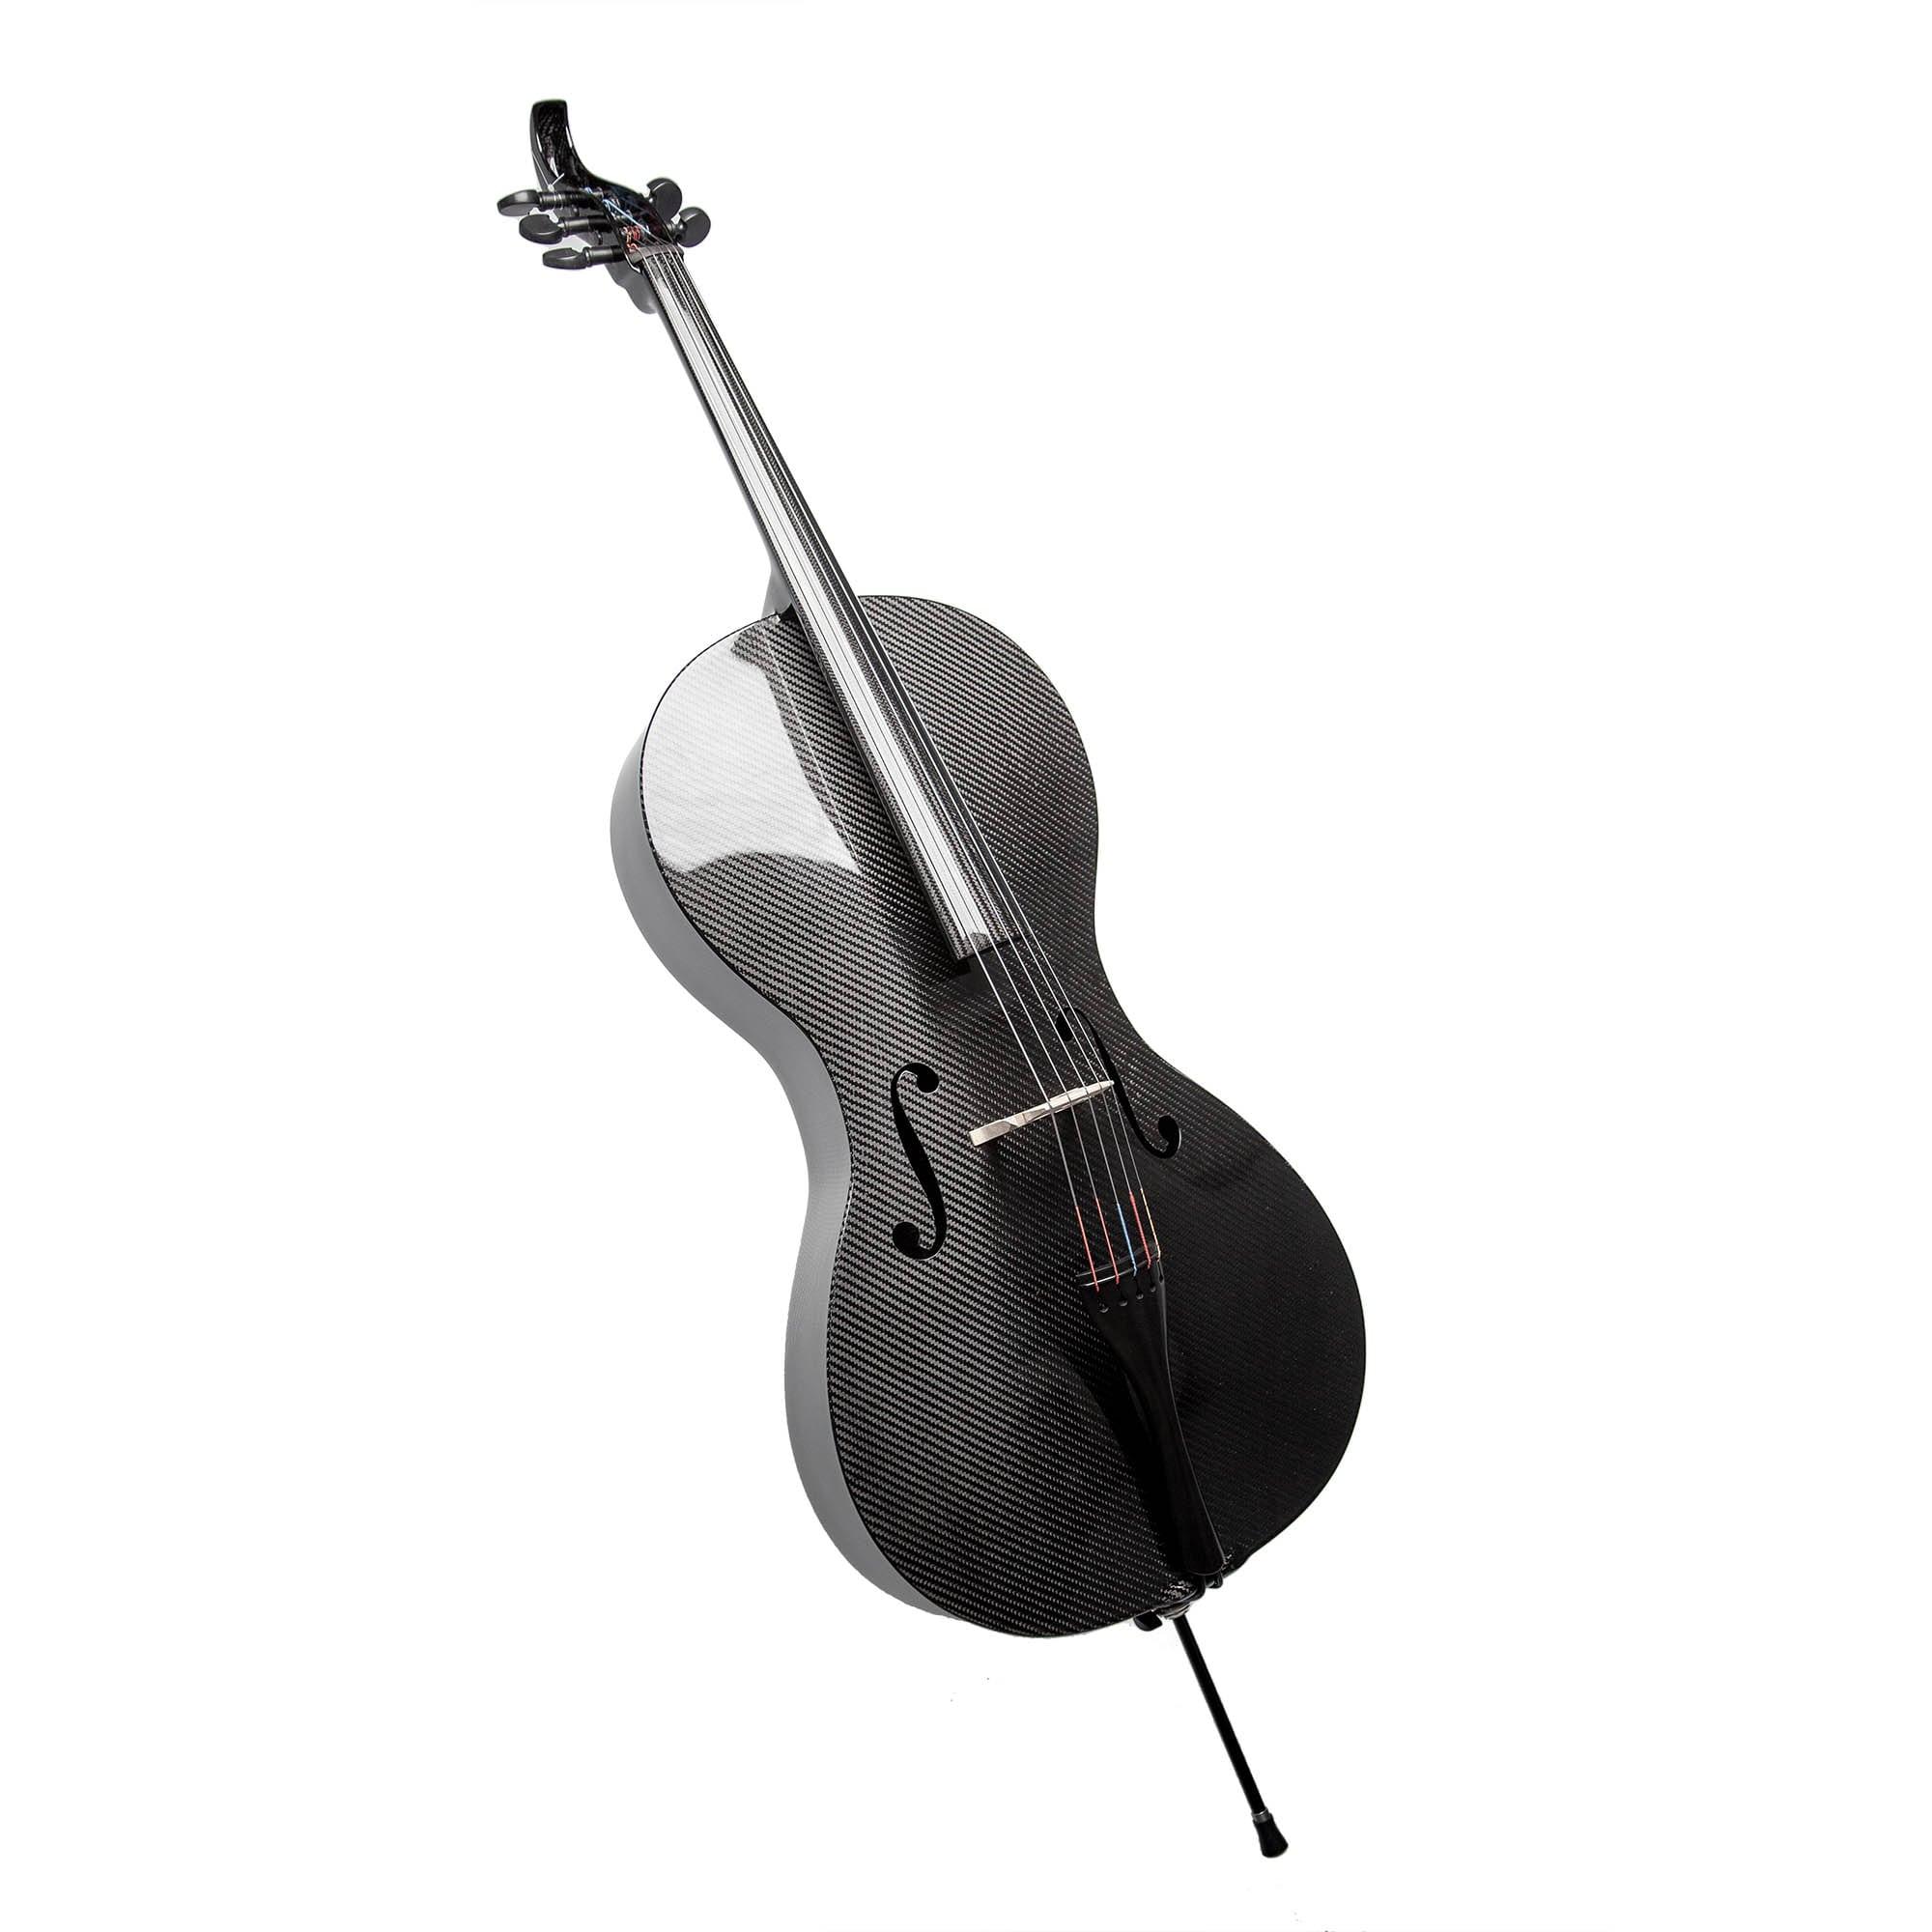 5-String Luis and Clark Cello. Photo: Kevin Sprague